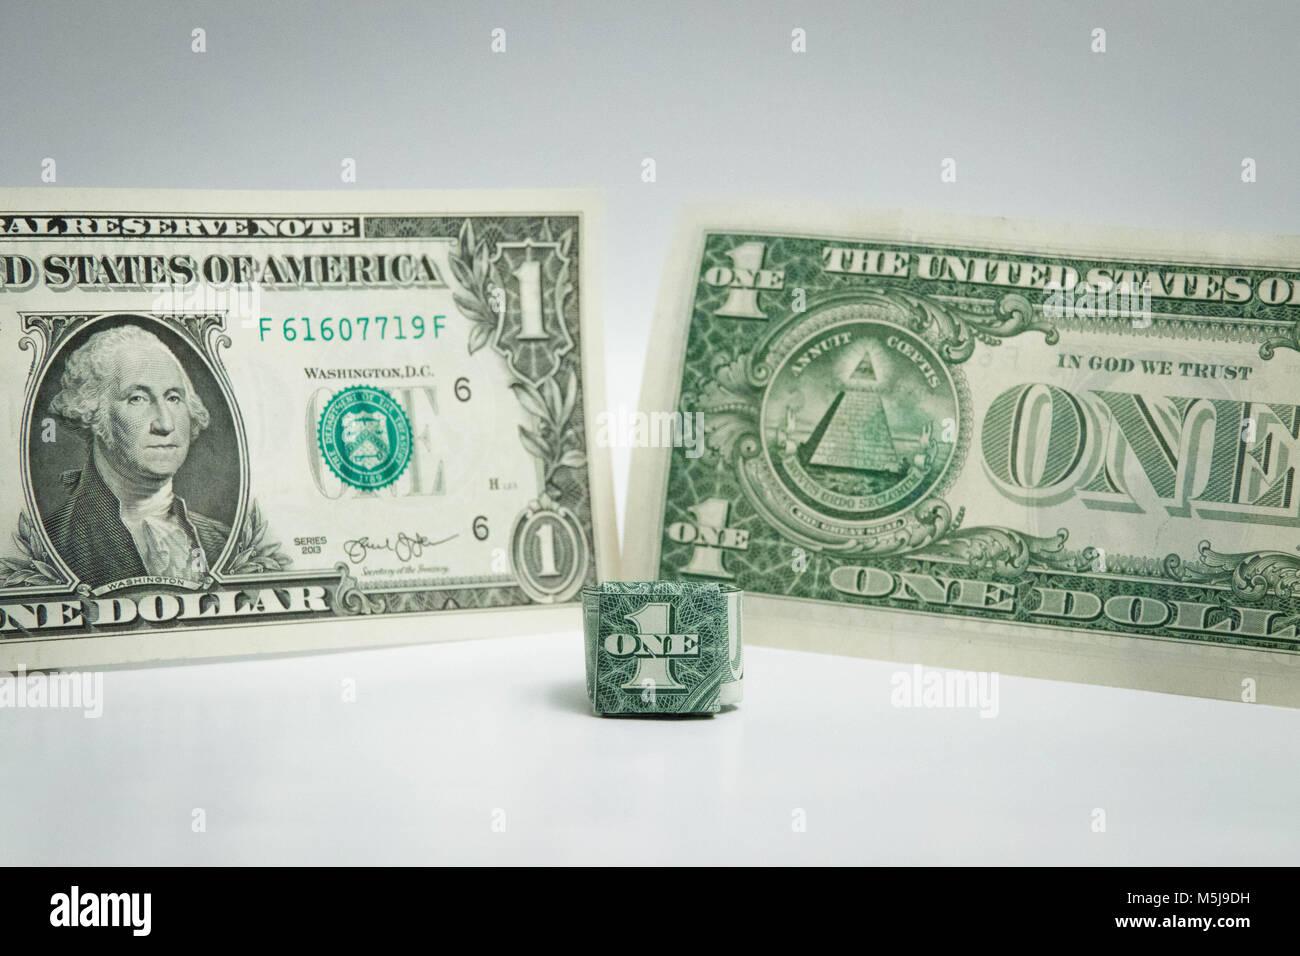 1 Dollar Bill Stock Photos & 1 Dollar Bill Stock Images ... - photo#34